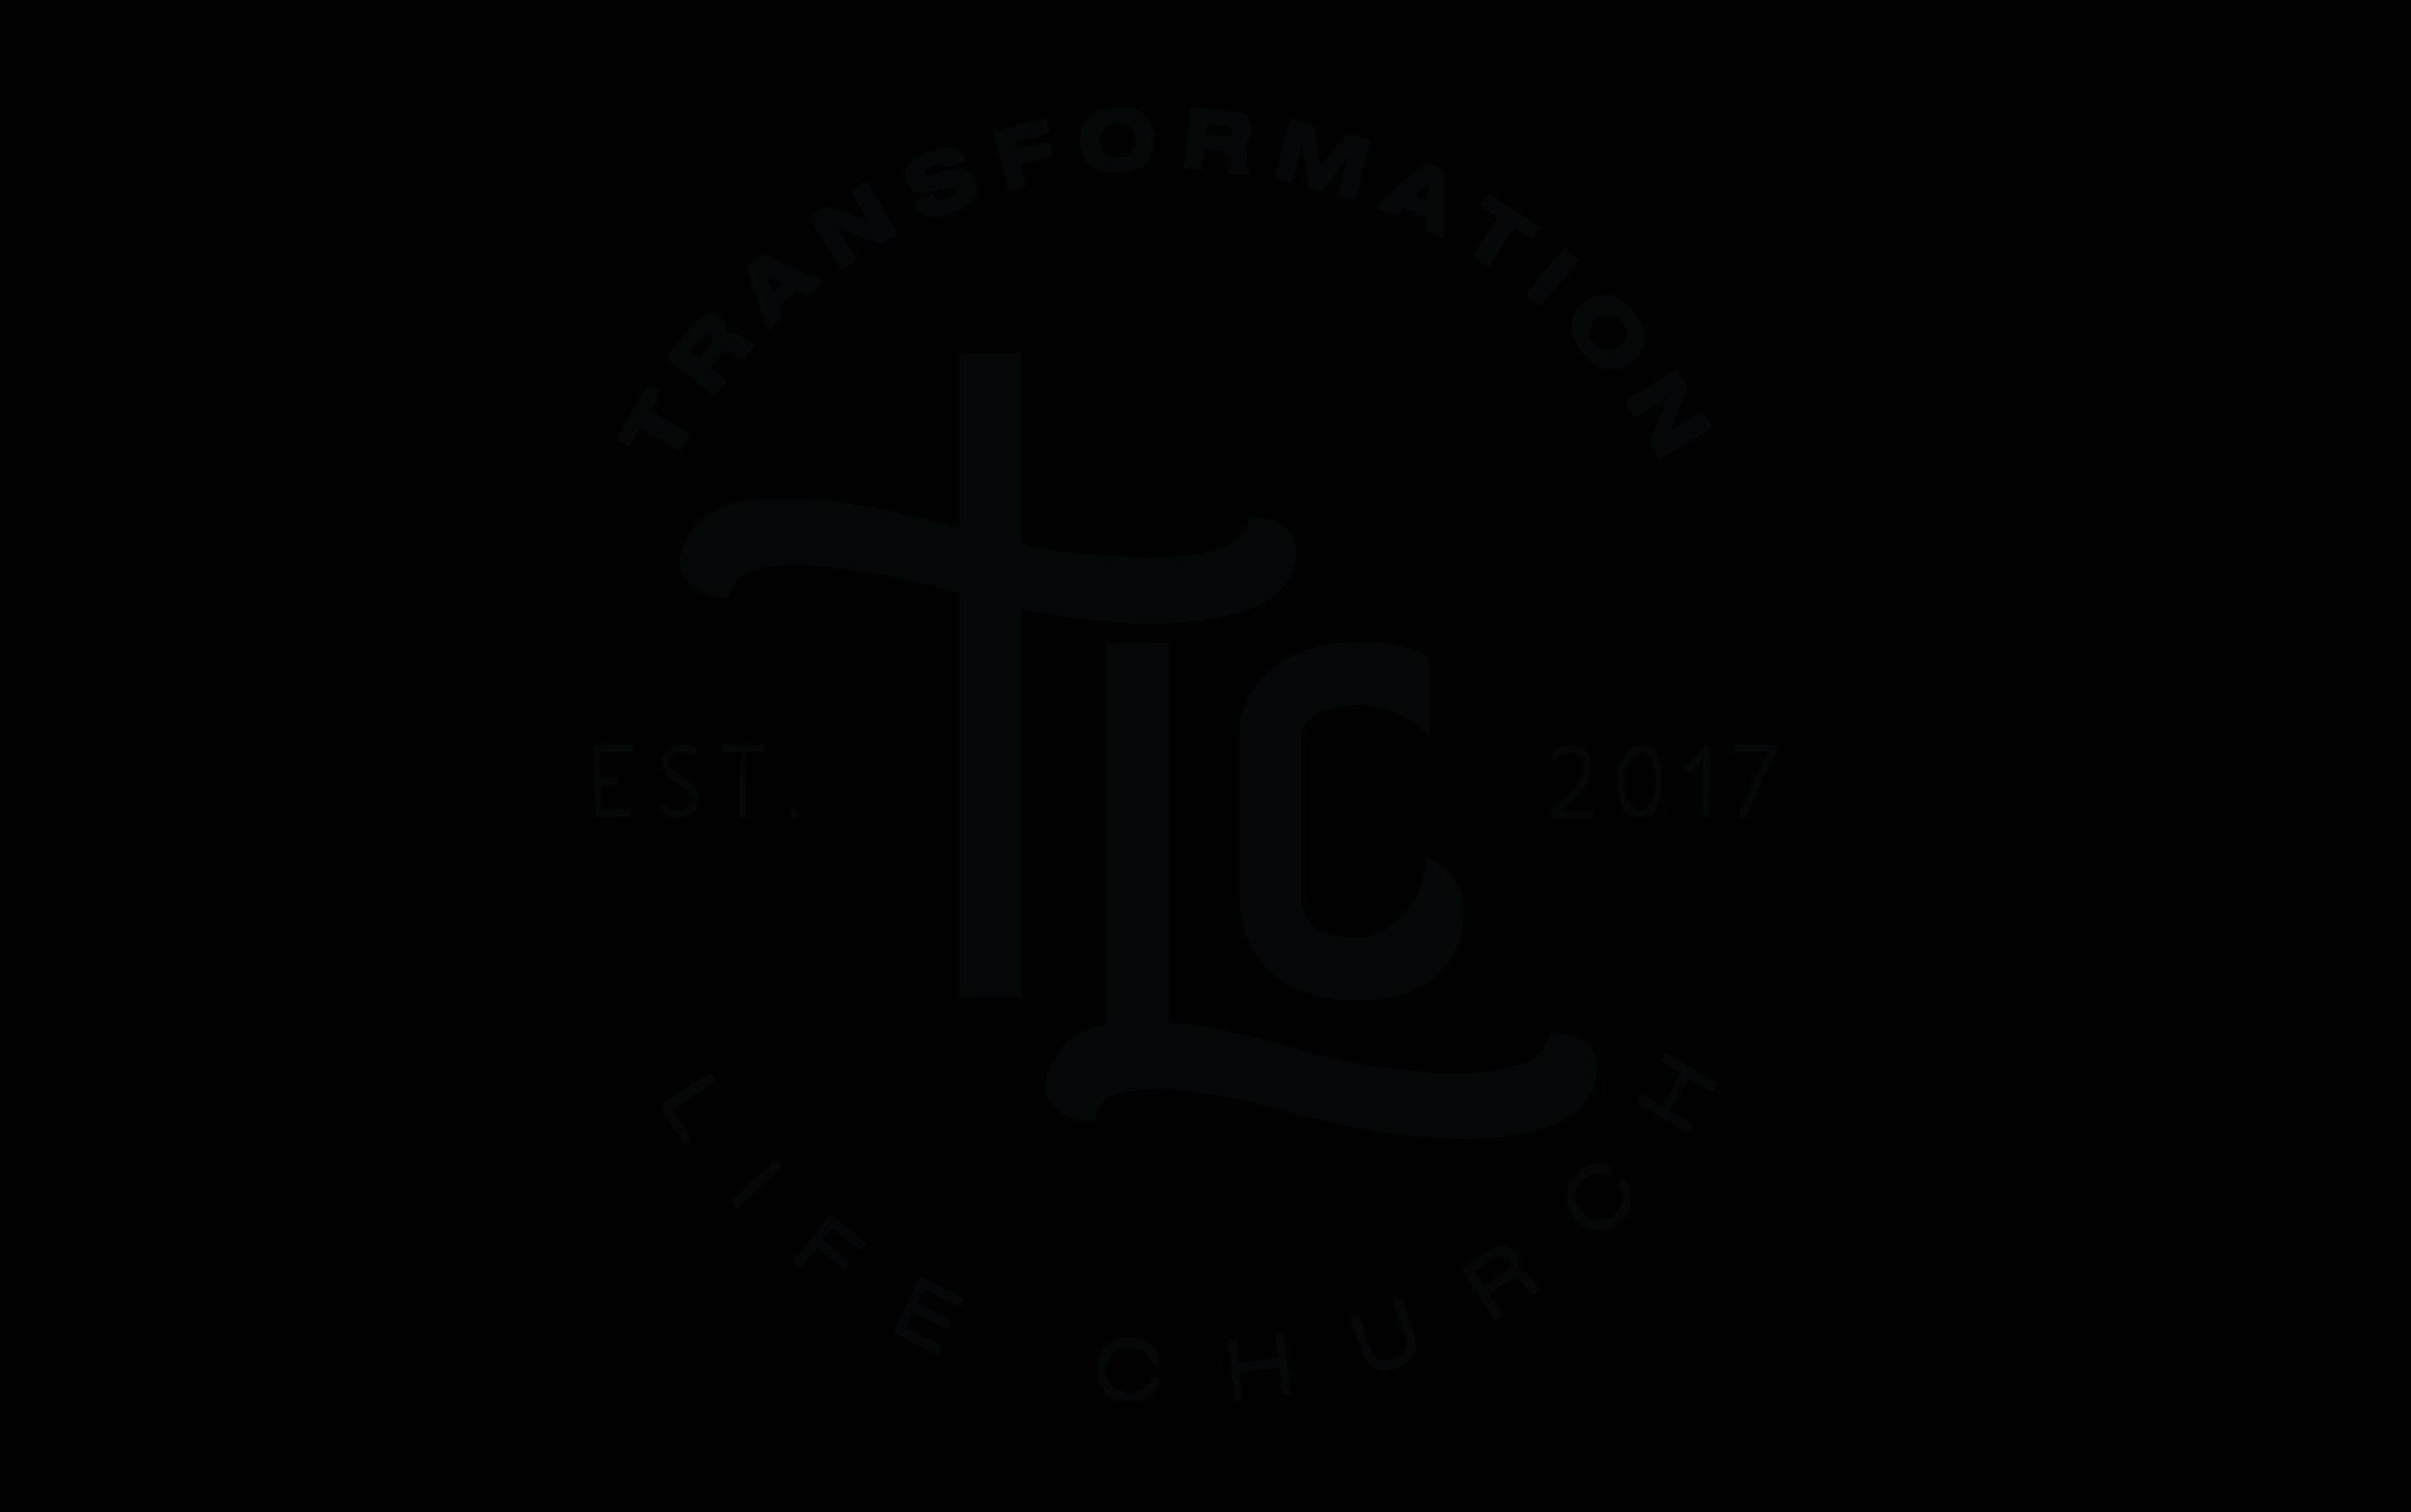 TransformLife_Final_FLAT-01.png